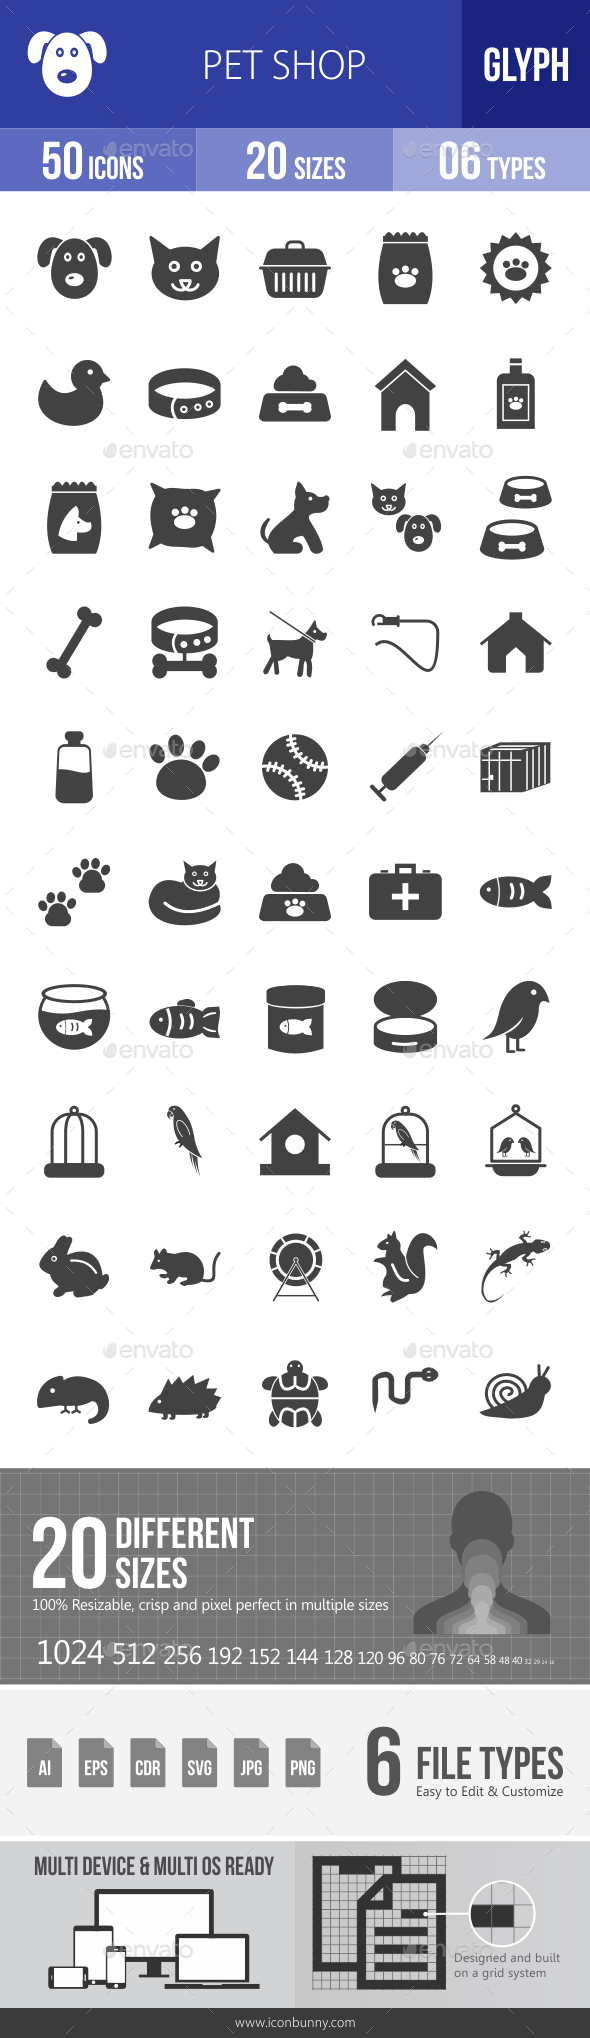 Pet Shop Glyph Icons - Icons